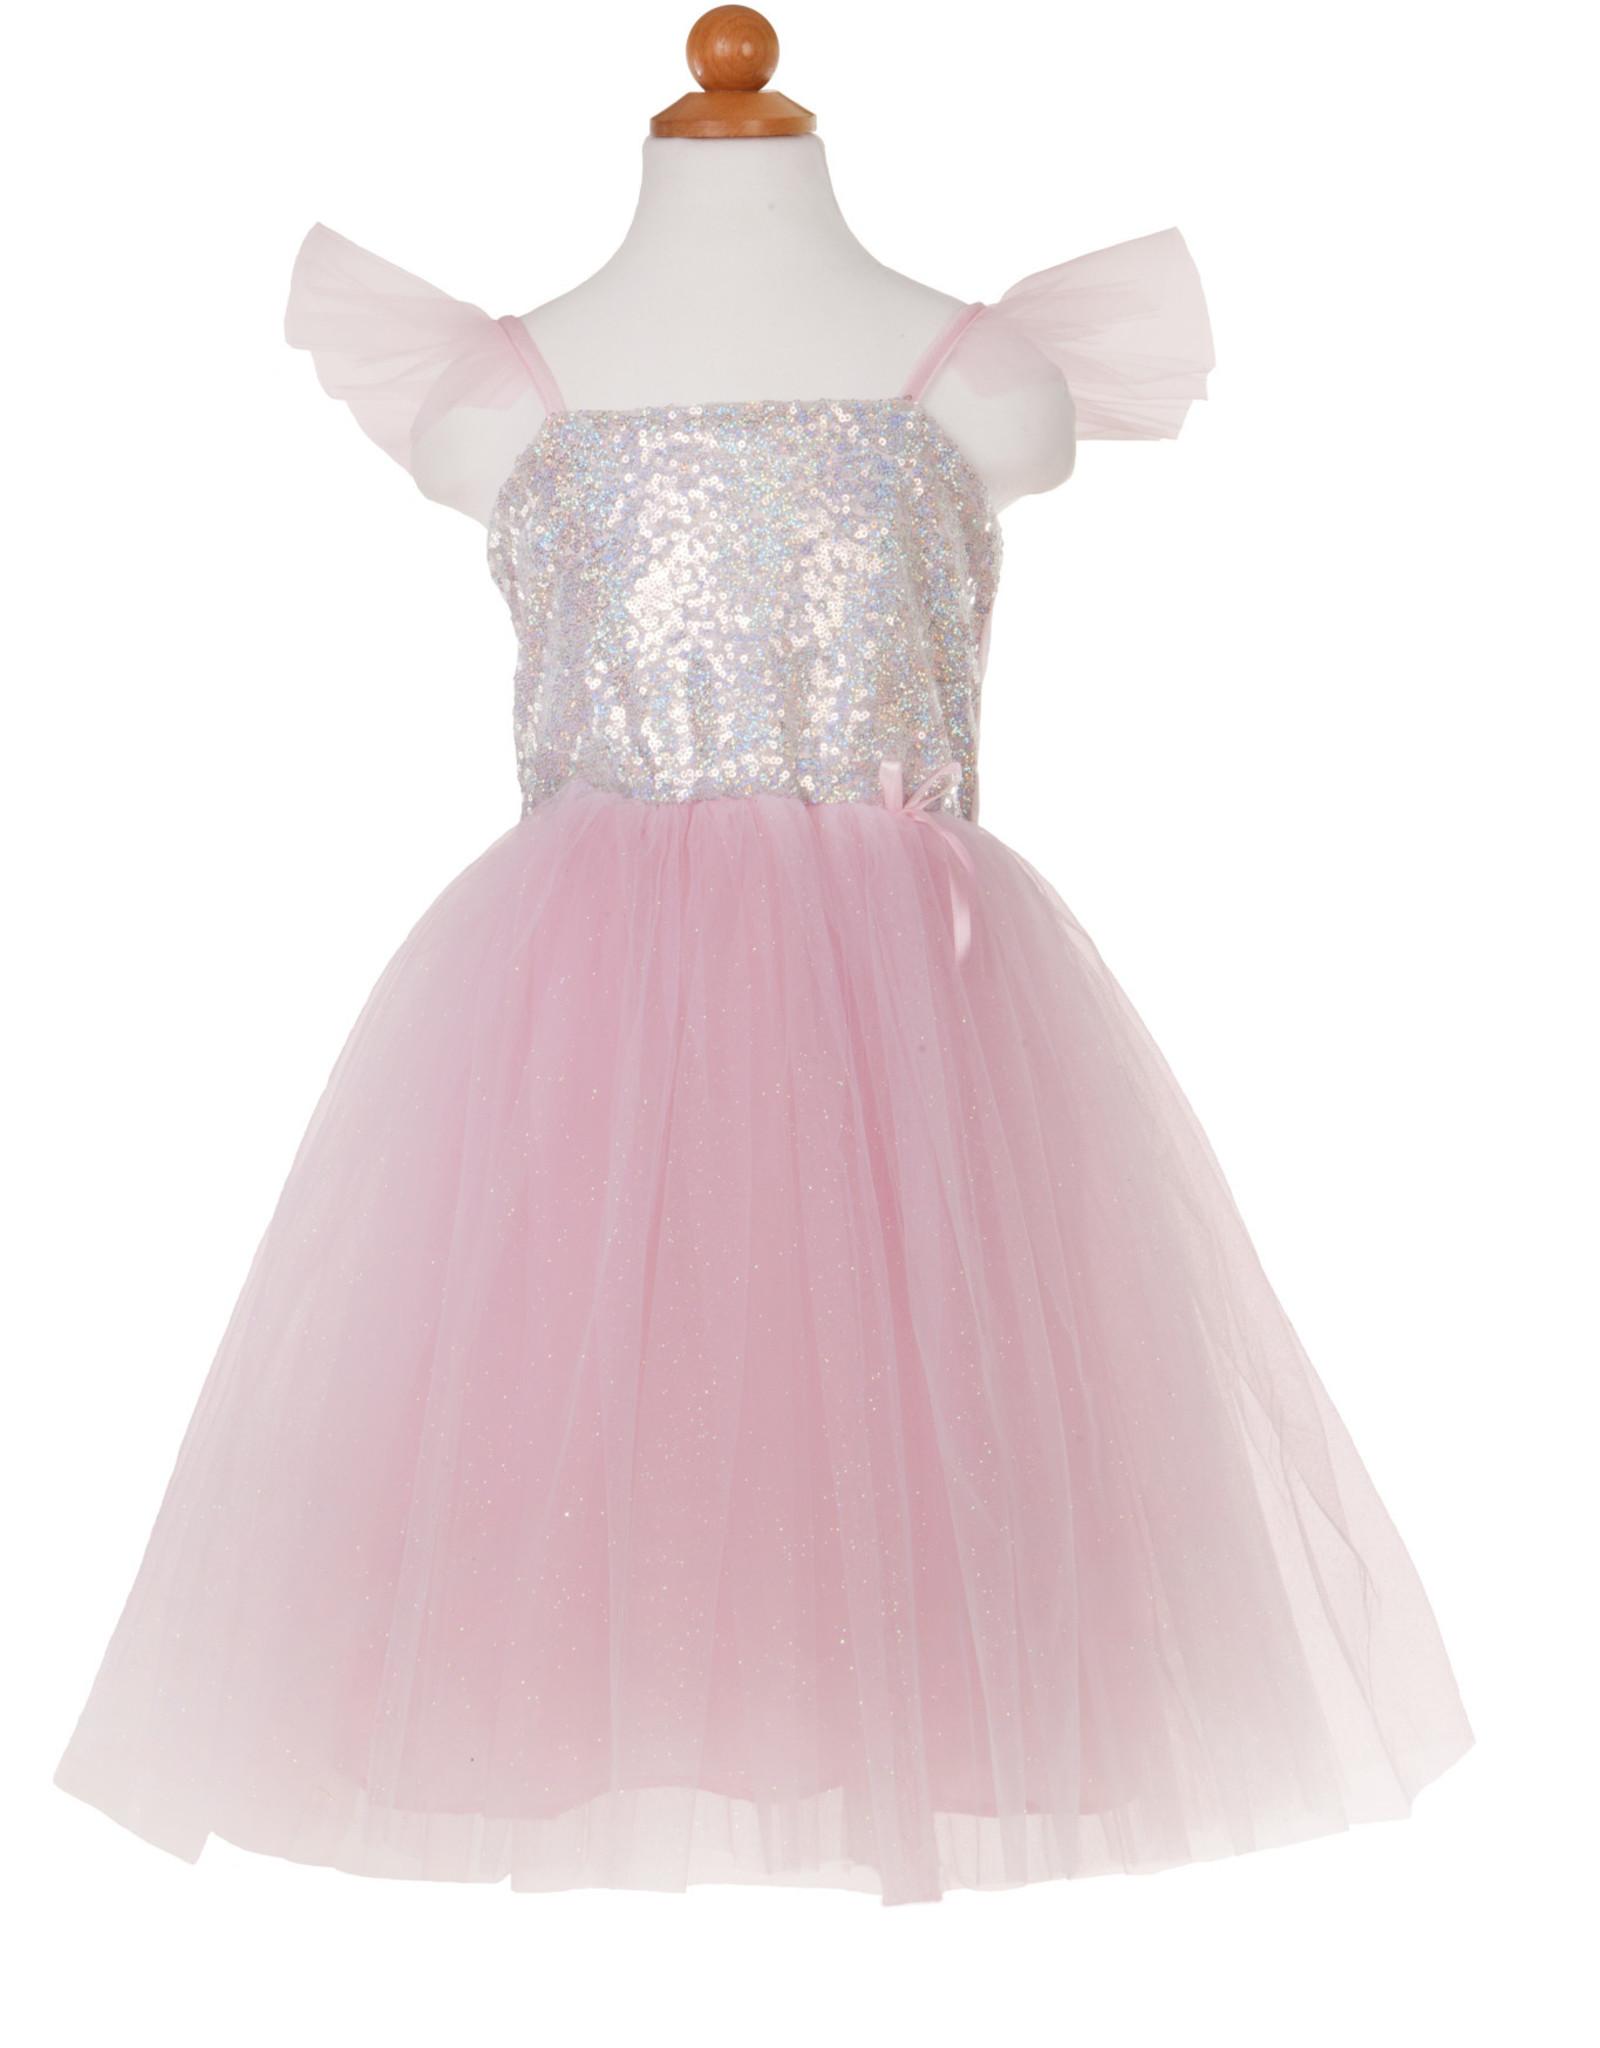 Great Pretenders Sequins Princess Dress - Pink - Size 3-4